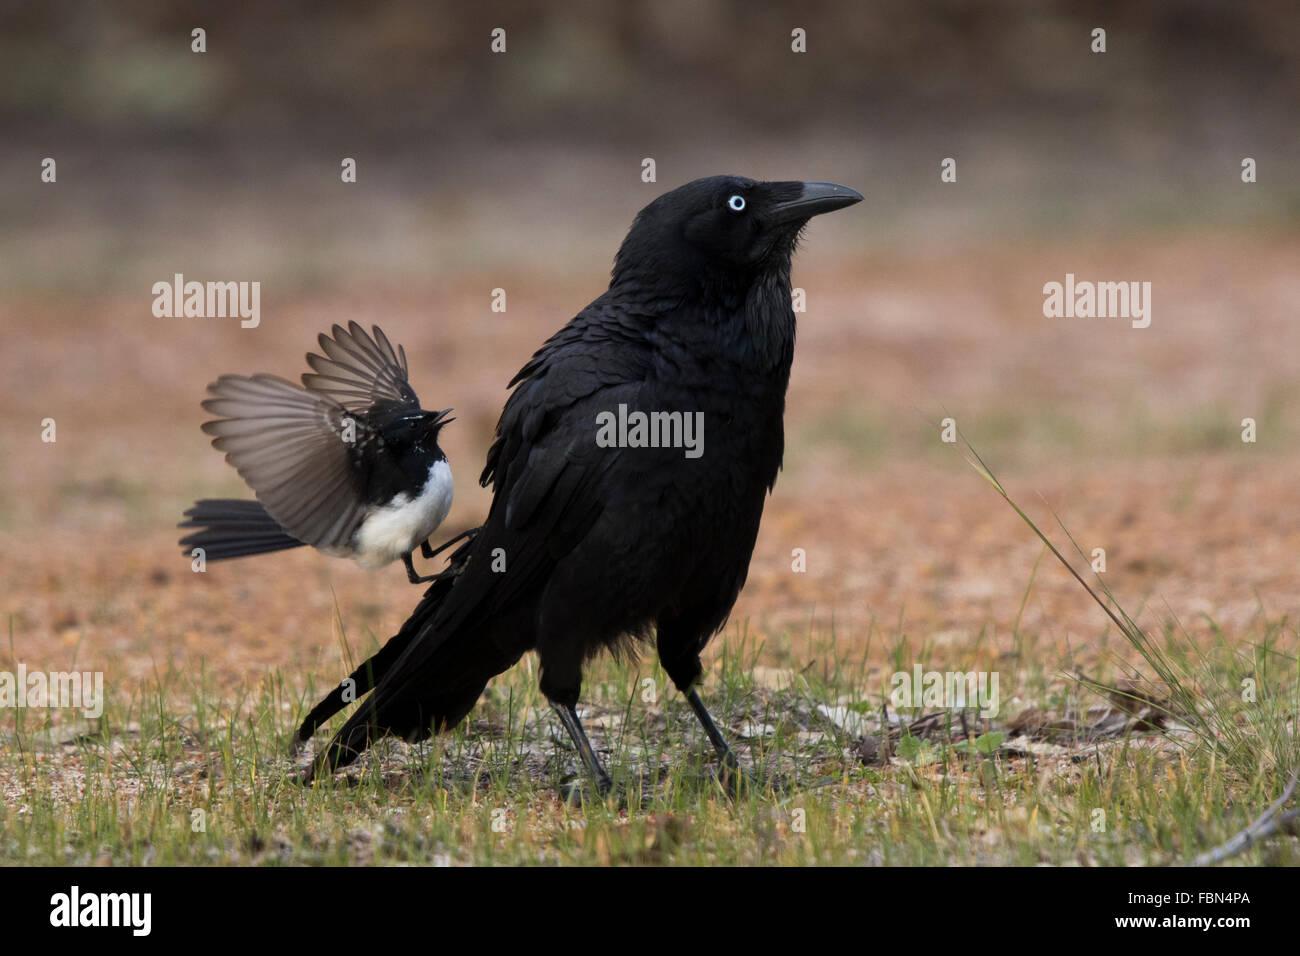 Willie Wagtail (Rhipidura leucophrys) attacking an Australian Raven (Corvus coronoides) - Stock Image